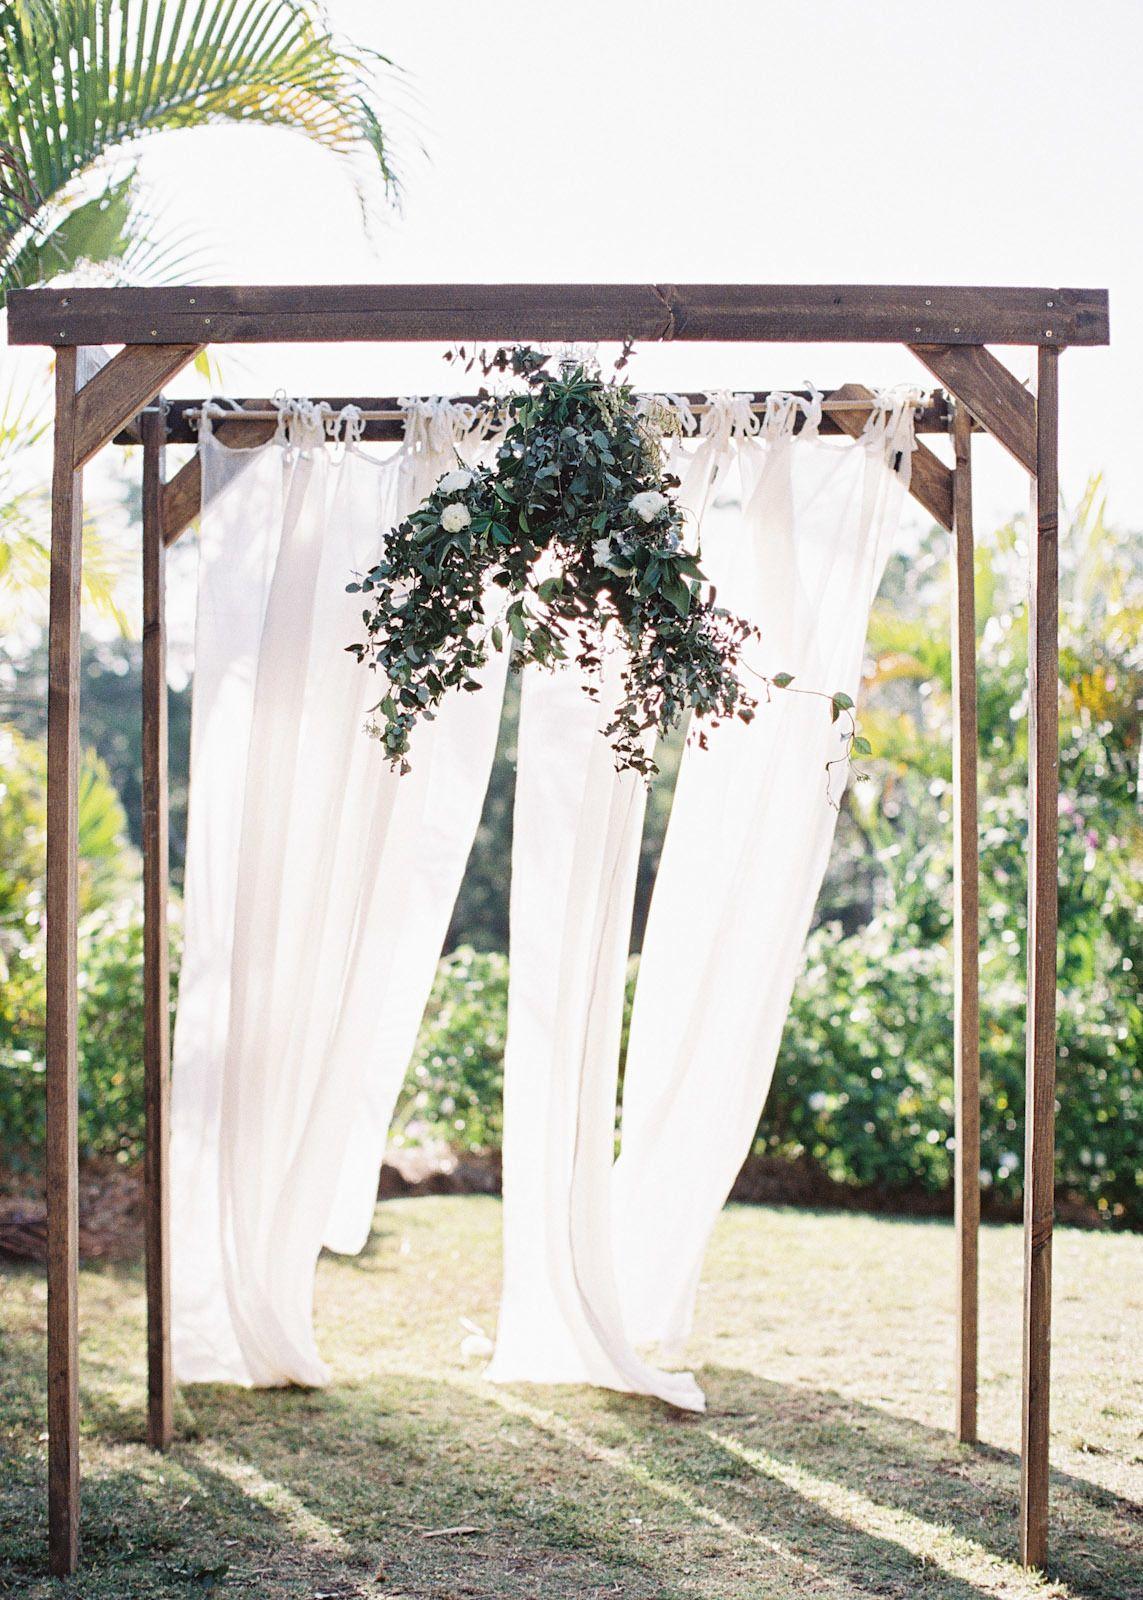 Rustic Chic Australian Shoot at Gurragawee | Wedding canopy, Rustic ...